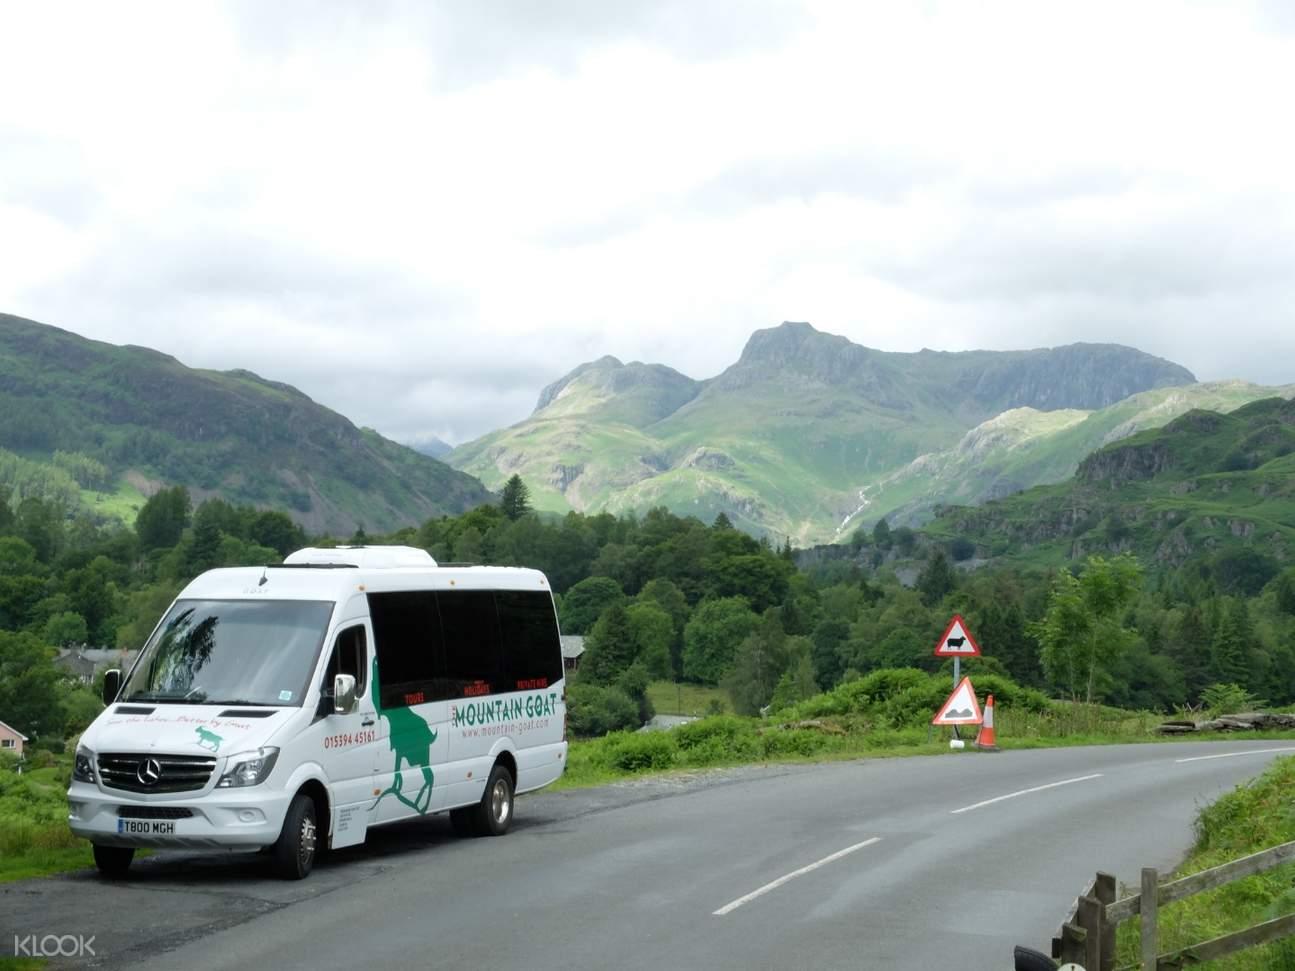 tour mini van on the road